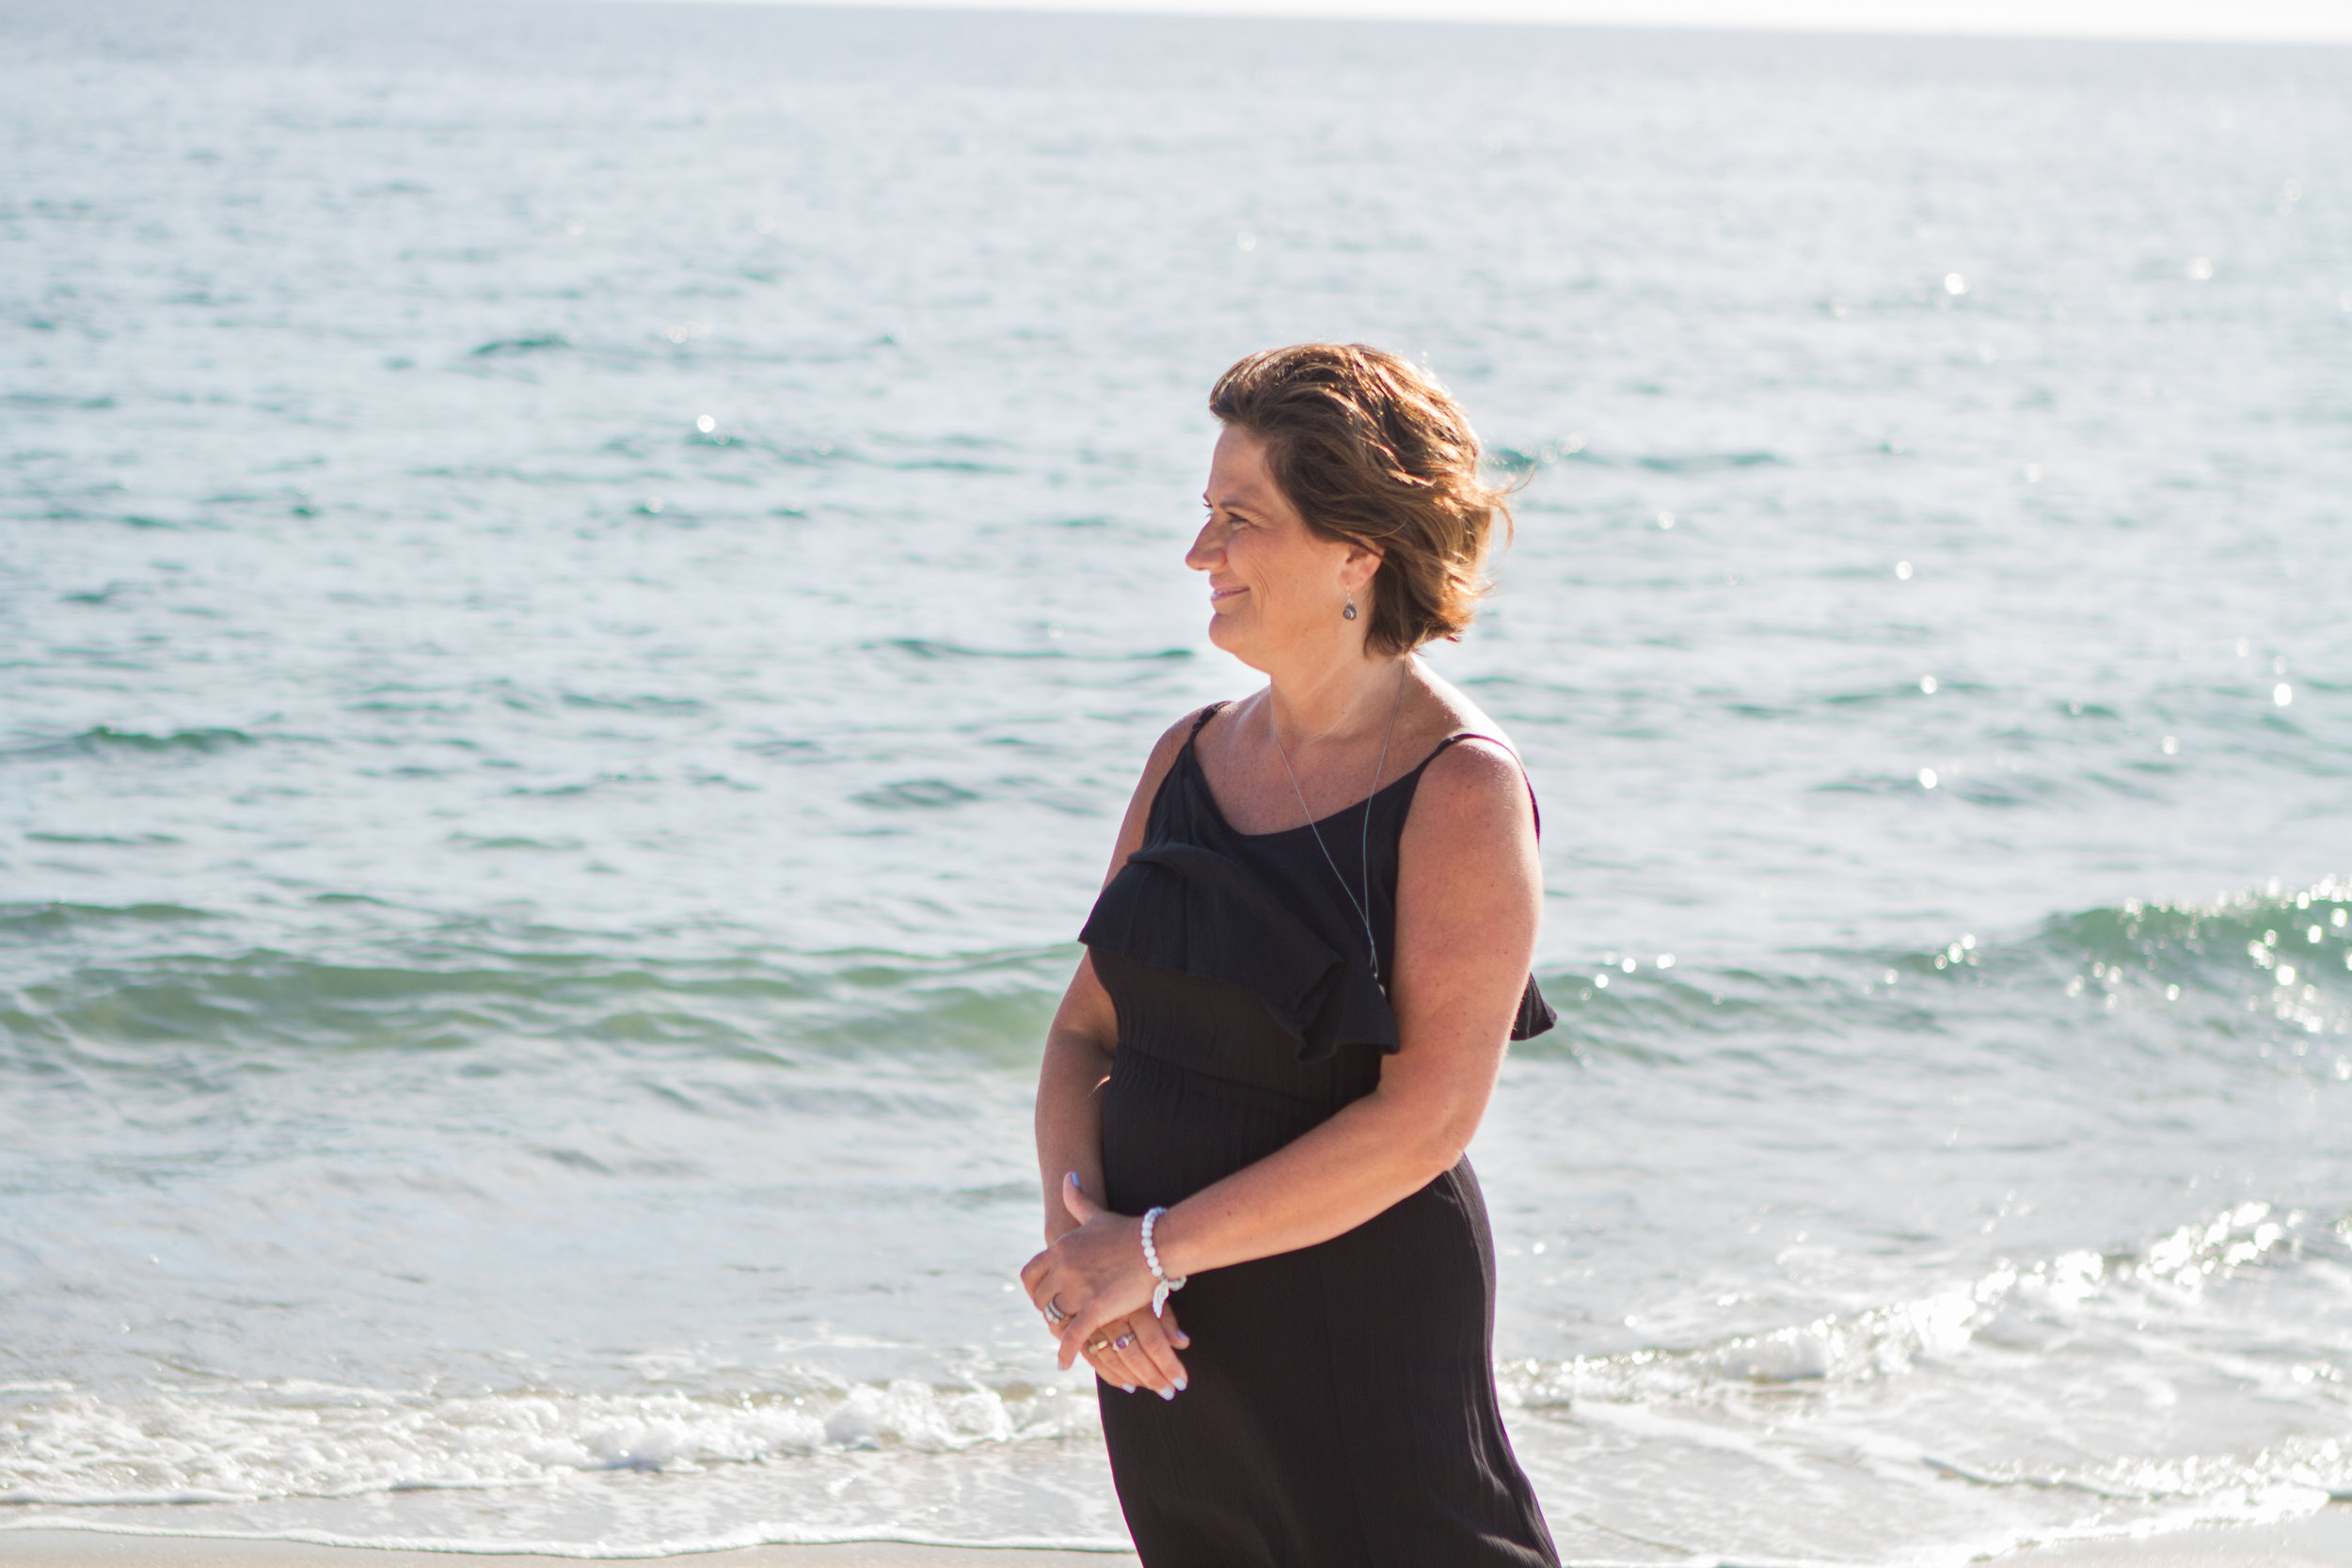 Small Business and Personal Brand Marketing Photographer, Duxbury Massachusetts, Shannon Sorensen Photography, Duxbury Beach, Scituate, Connecticut, Rhode Island, New England